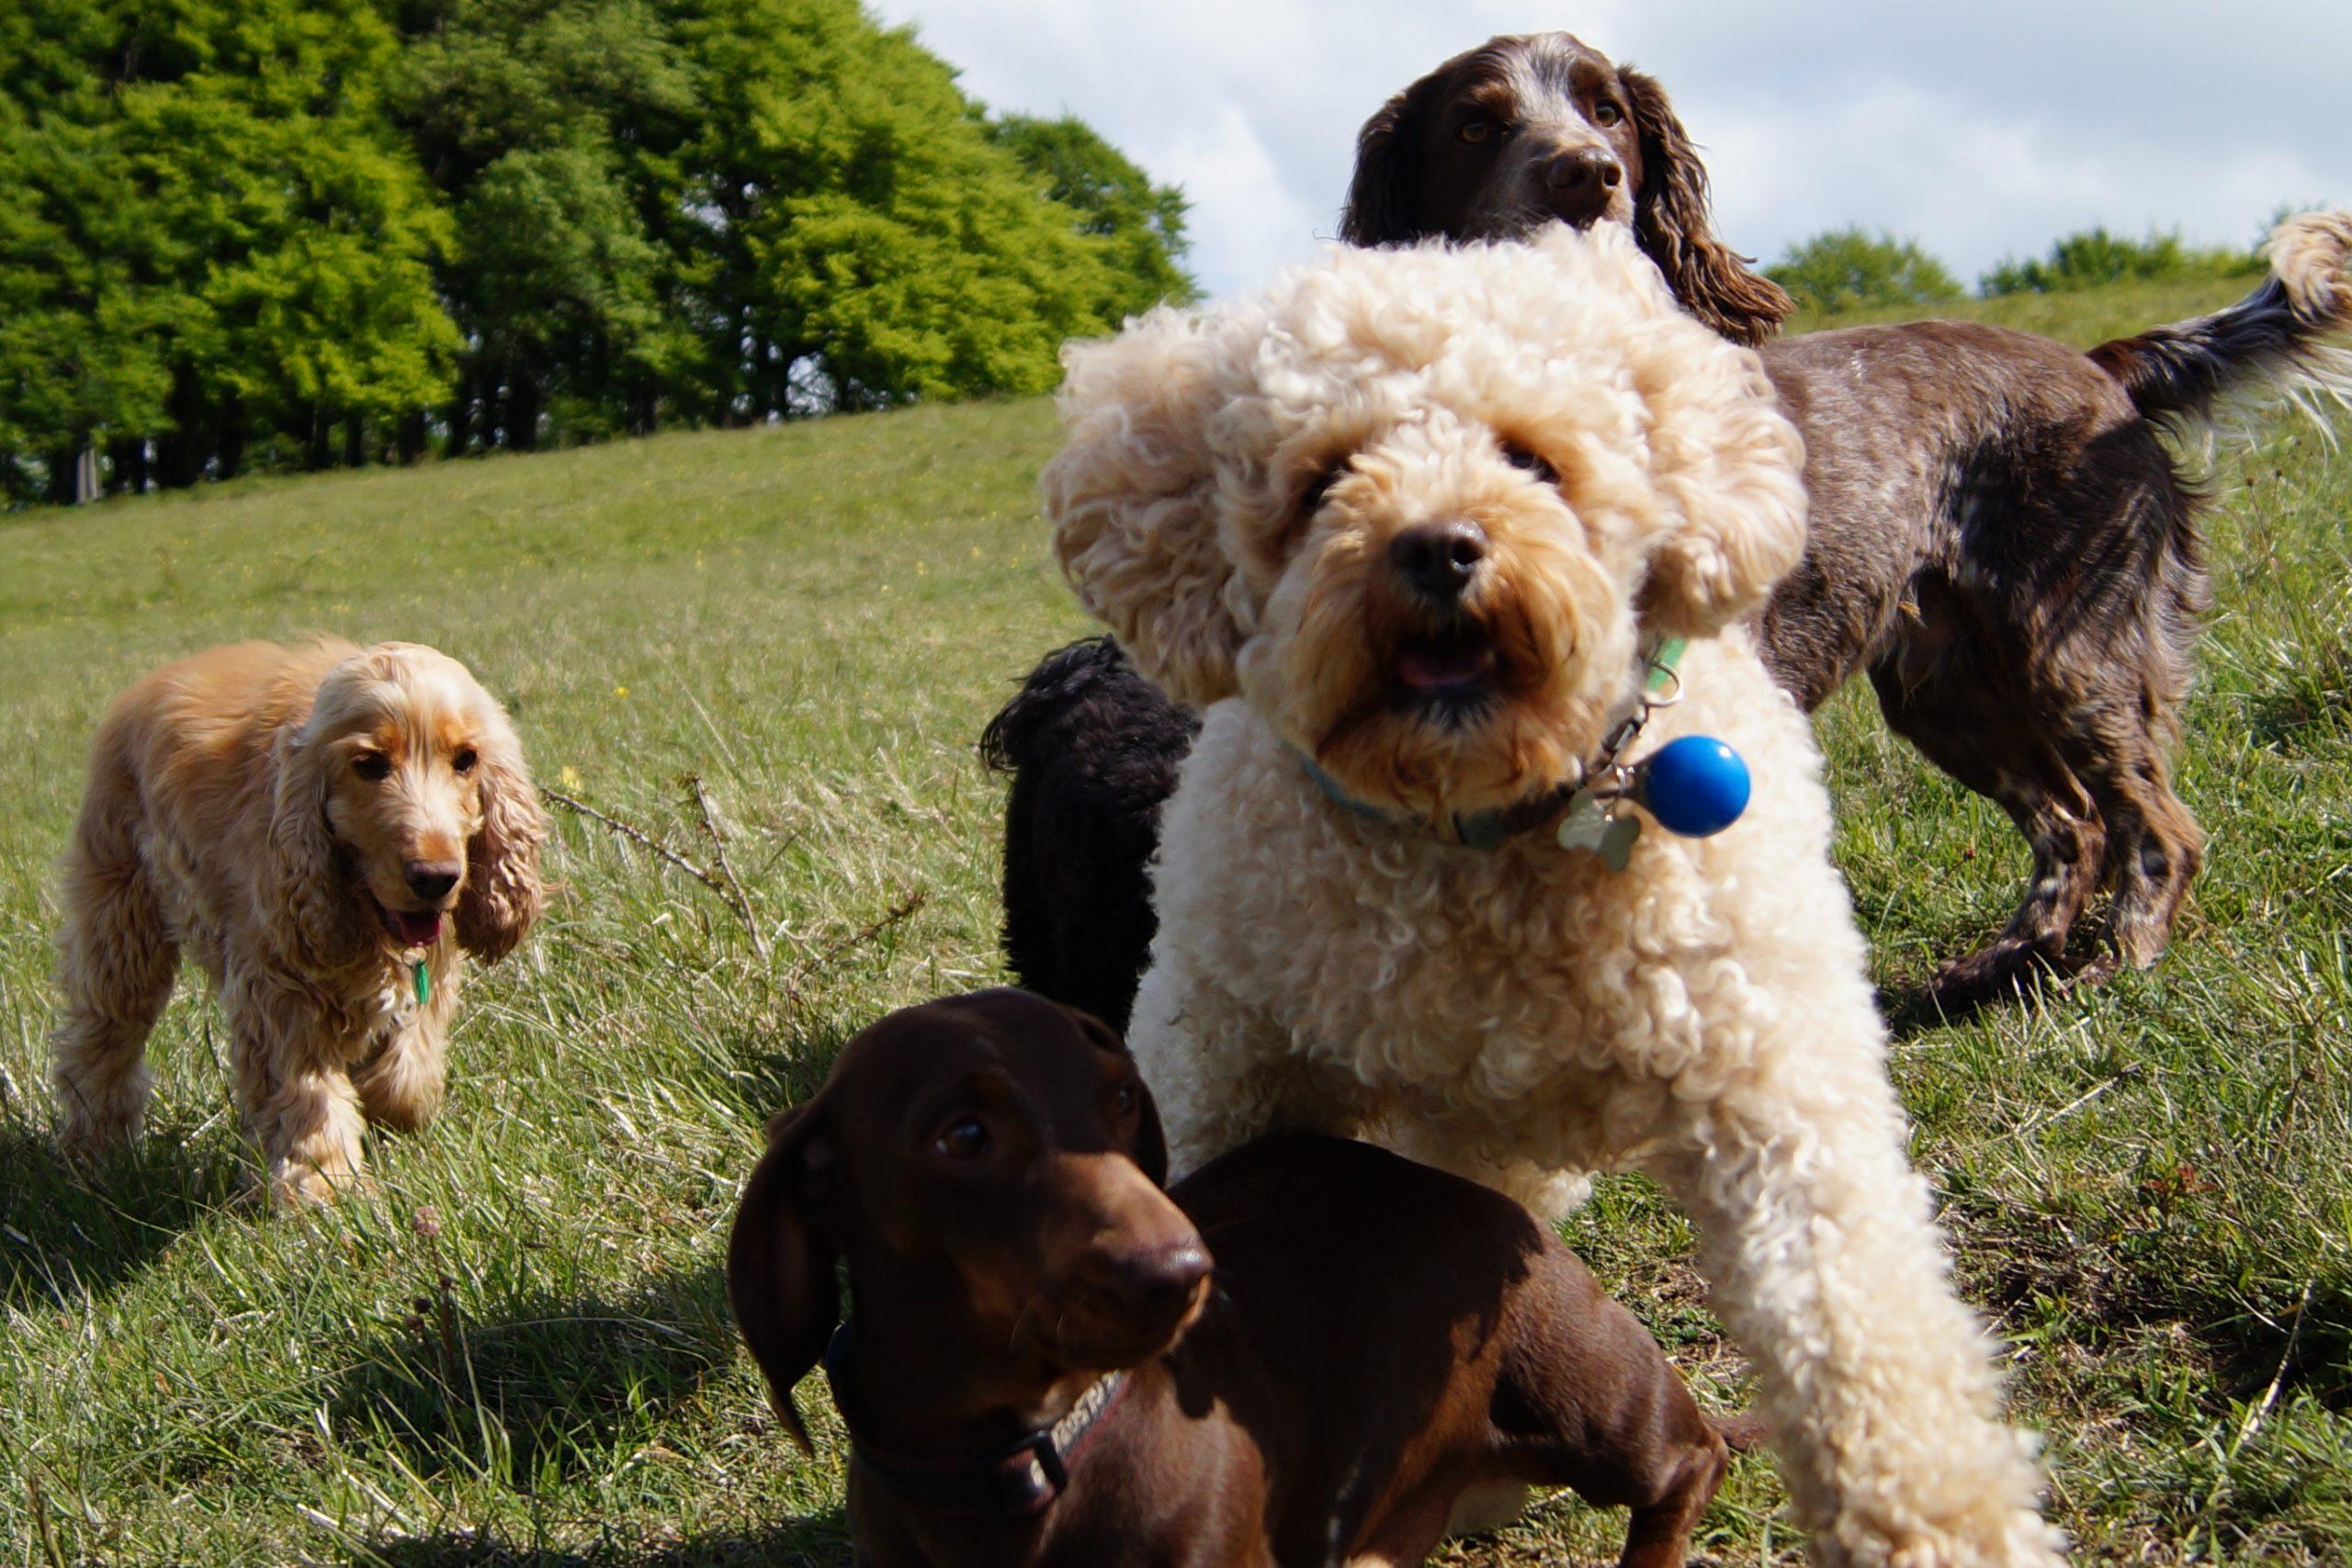 Dog Day Care and Training - Walks